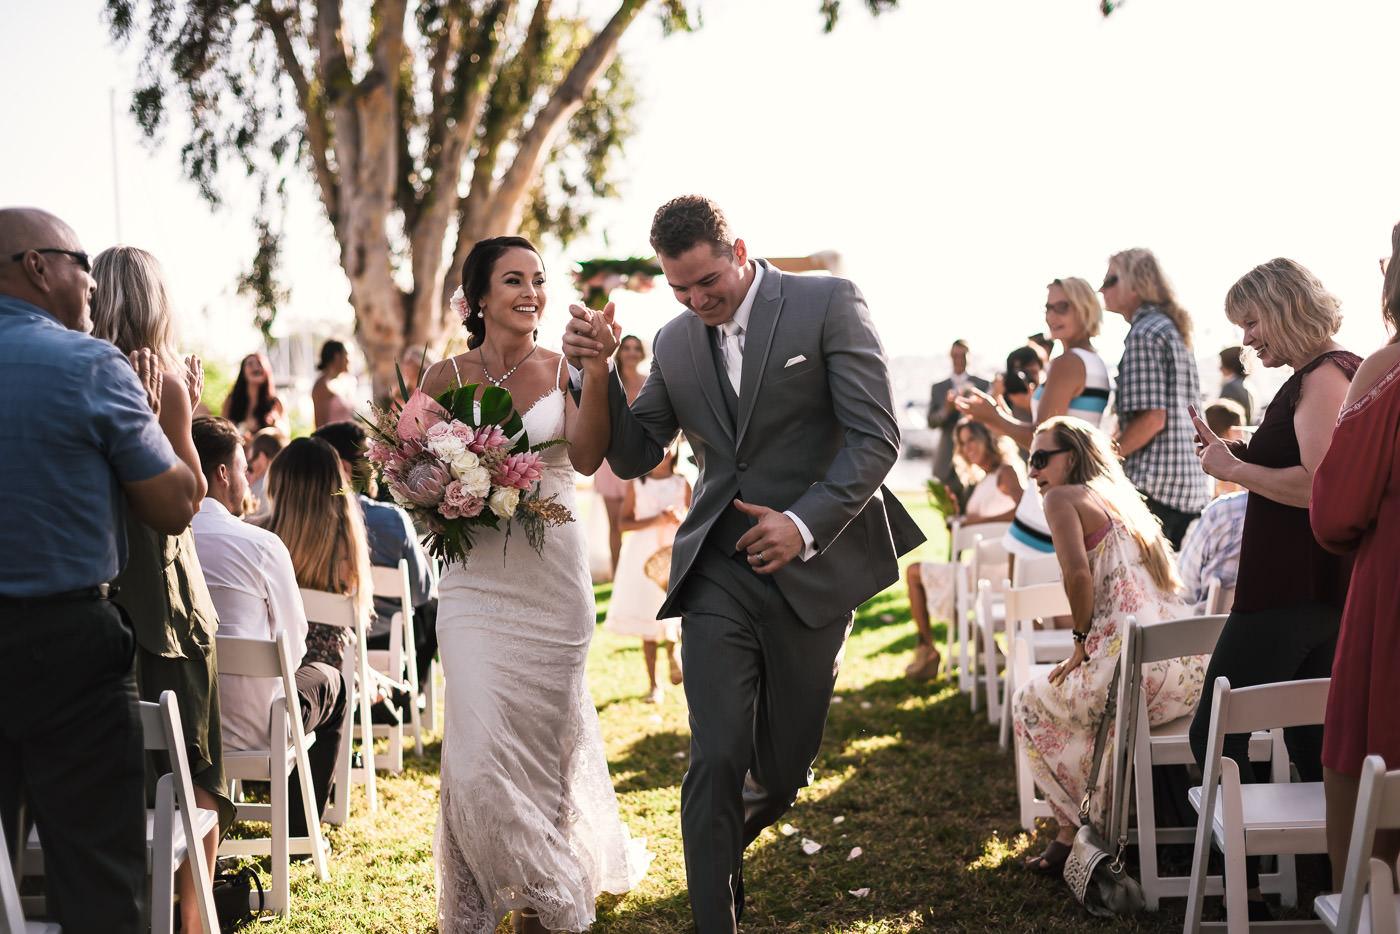 Wedding photographer near San Diego California.